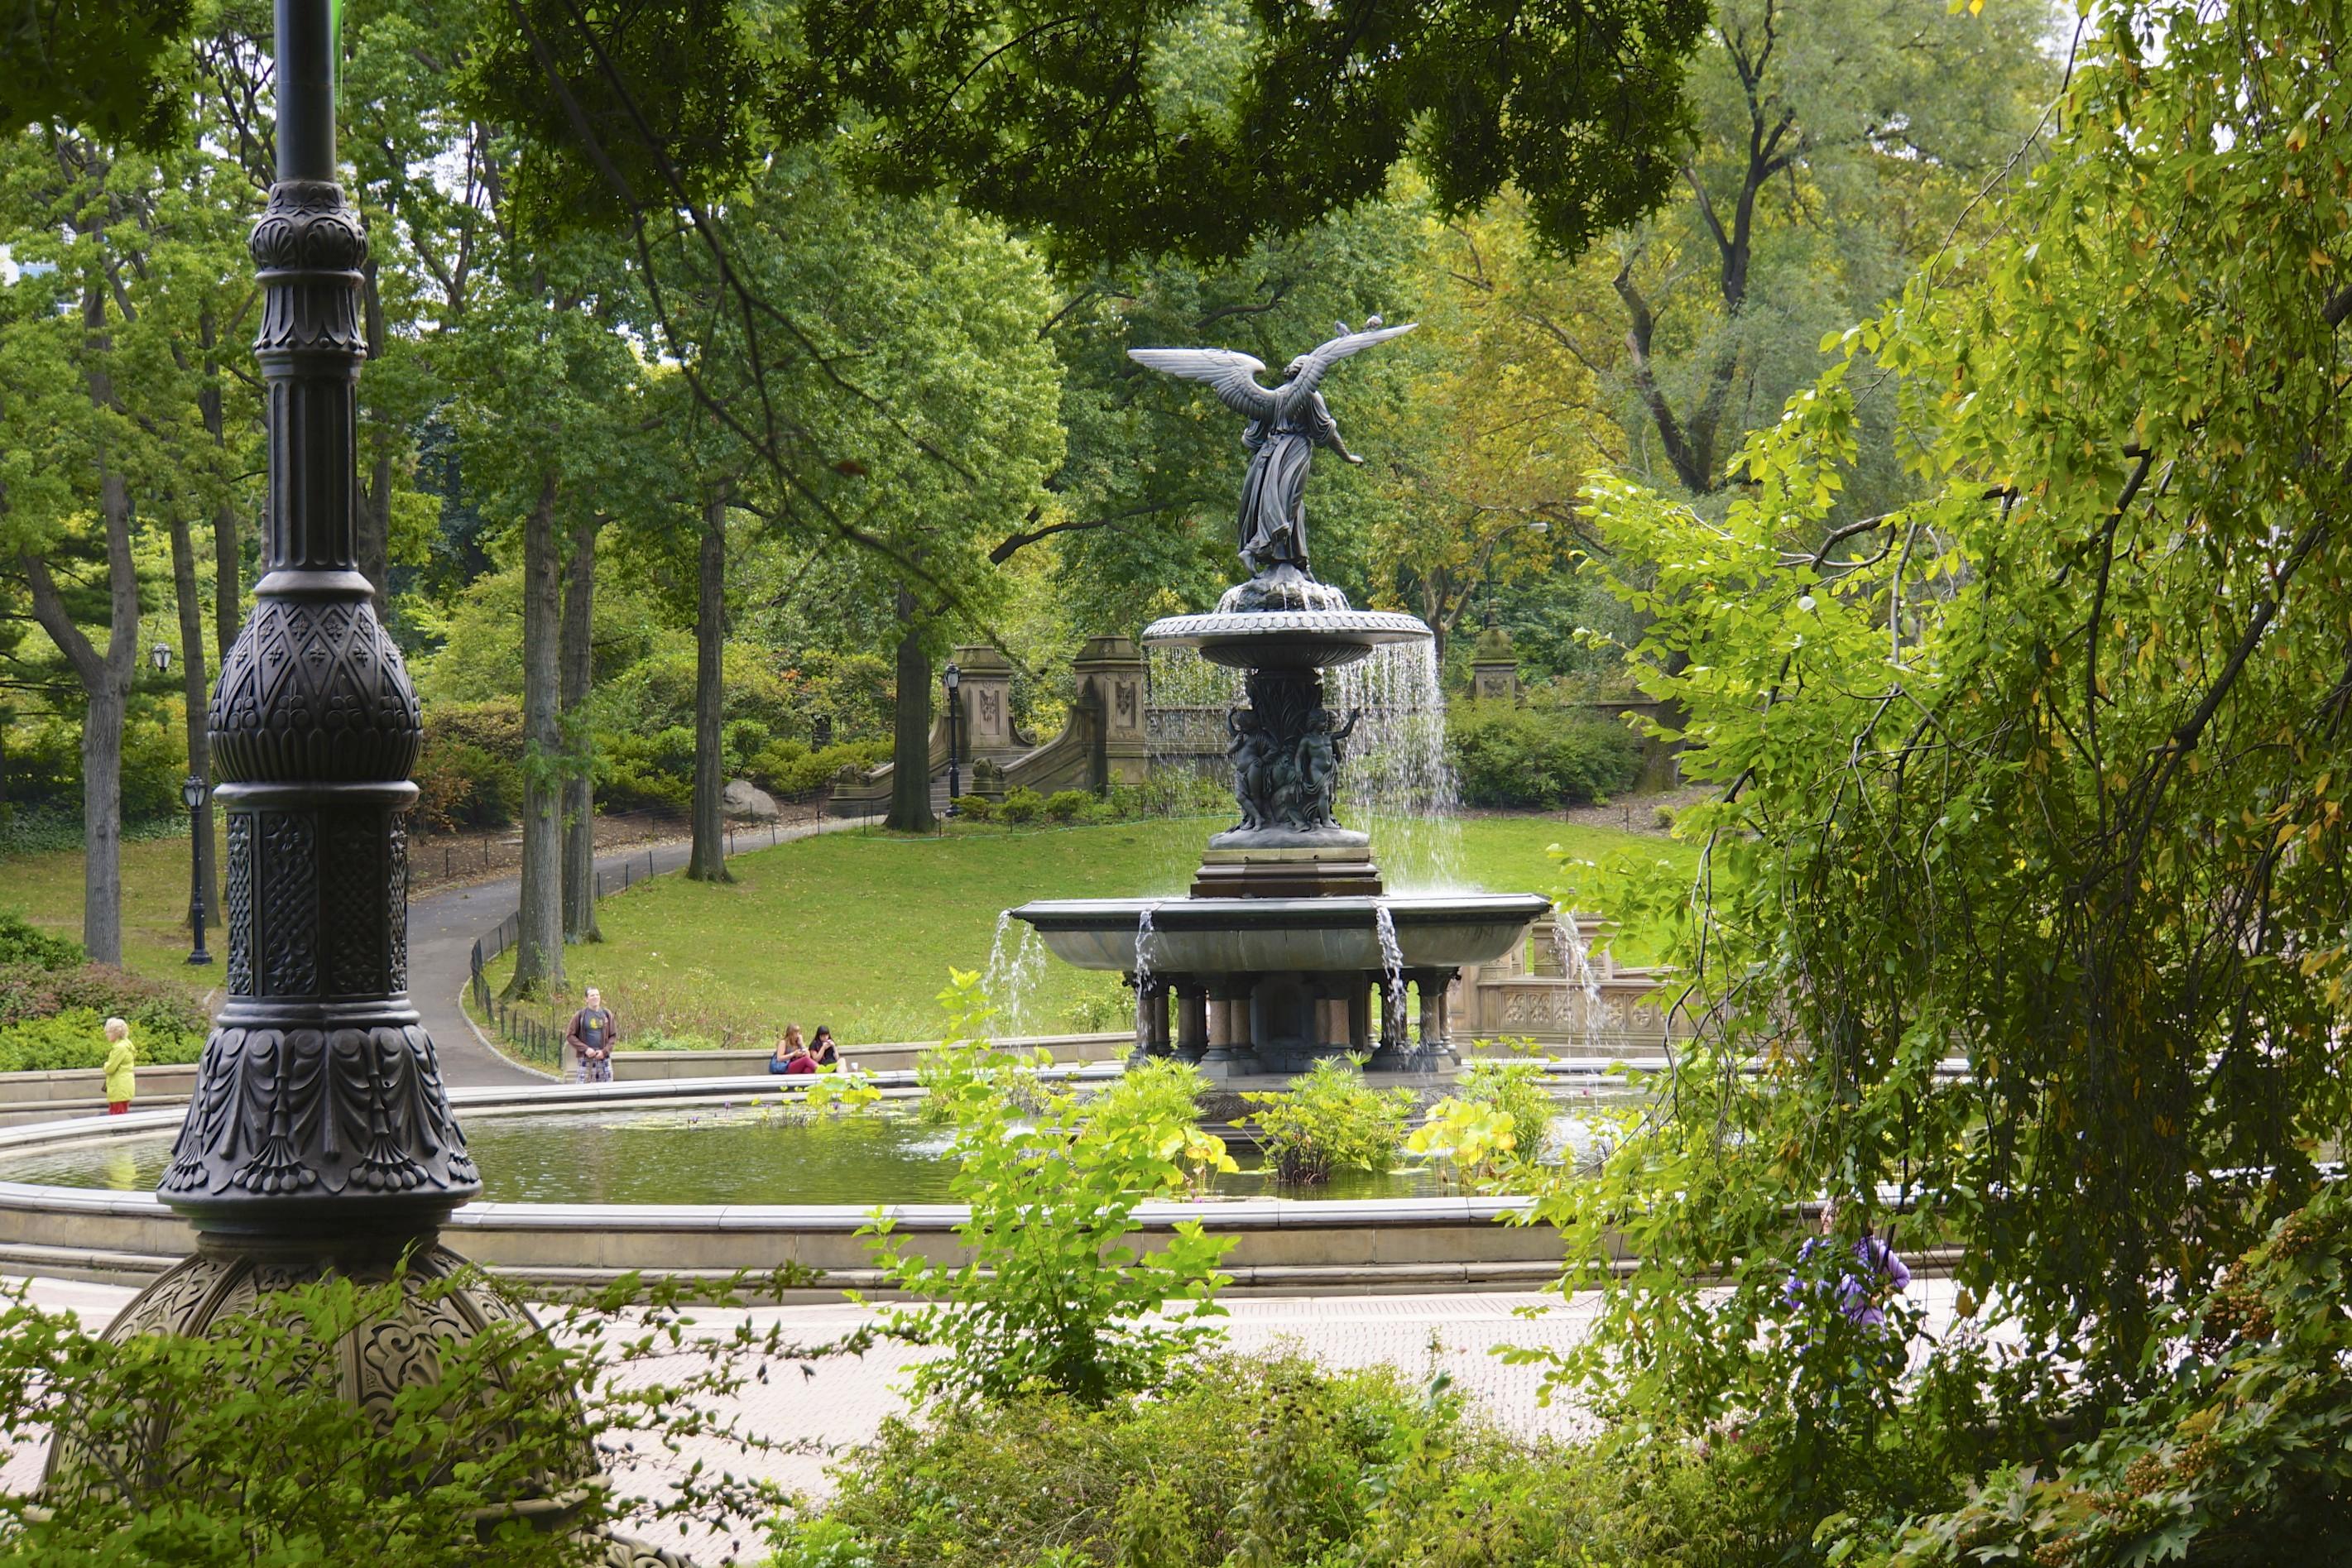 9-2013 New York 22301 - Version 2